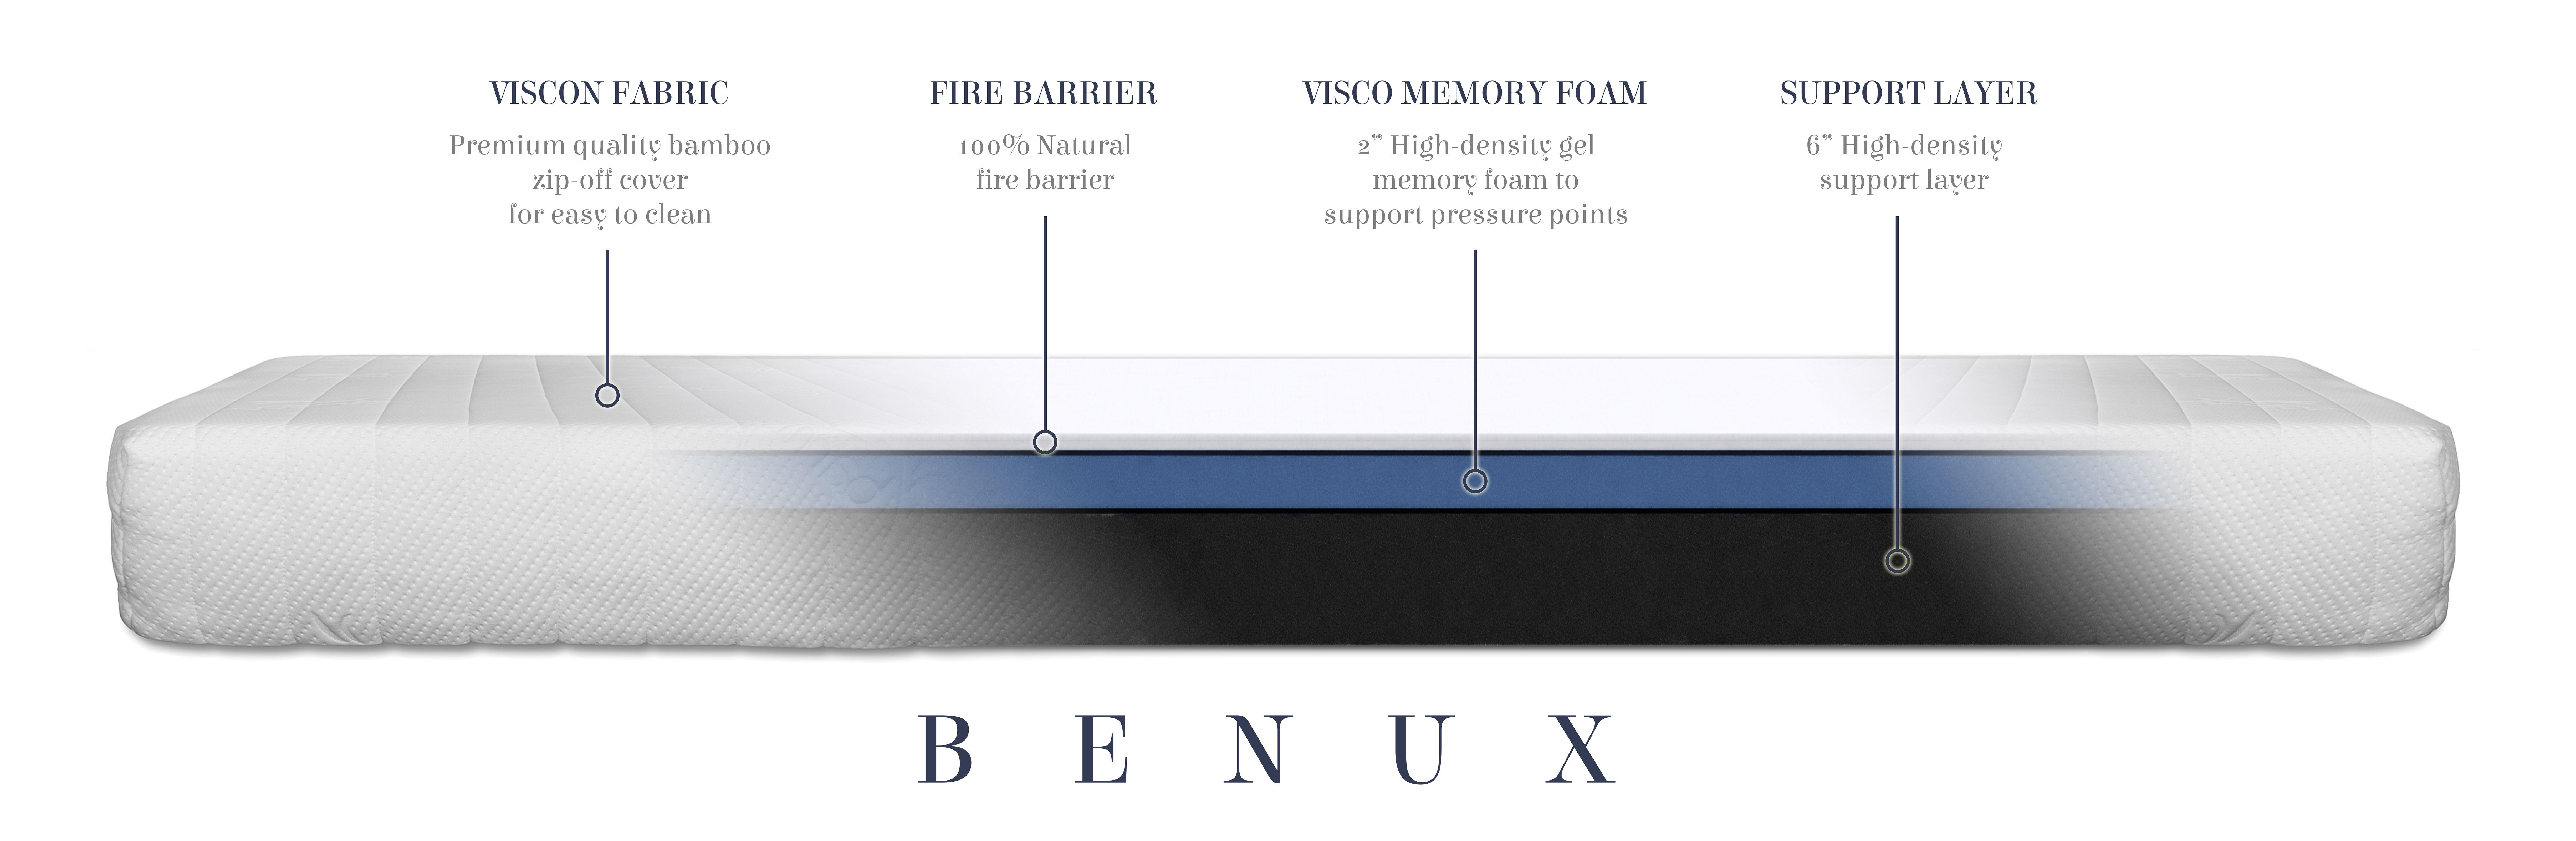 sneakpeek inside our benux mattress 100 organic bamboo cover